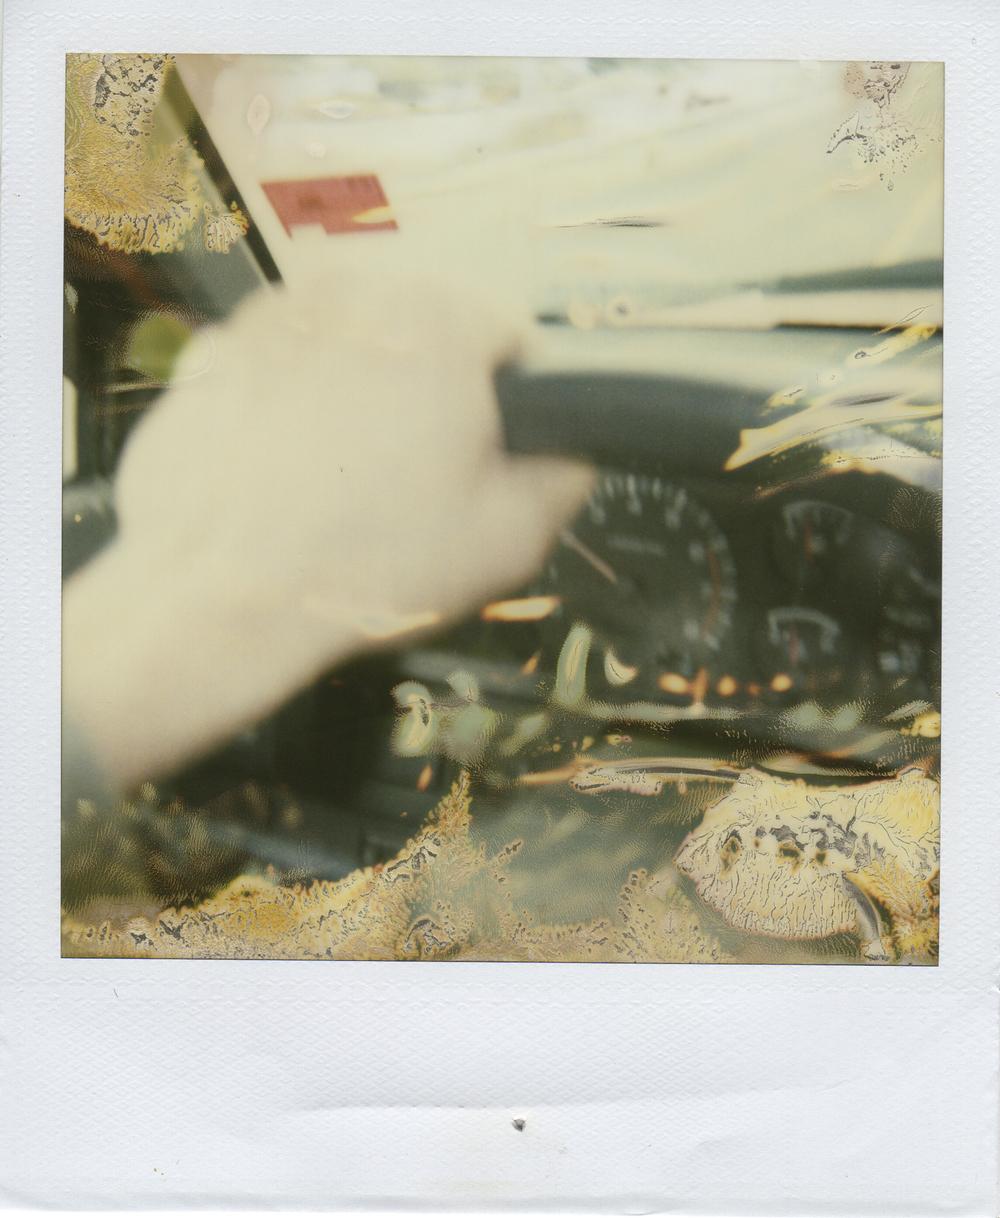 jlaurence-polaroid-086.jpg